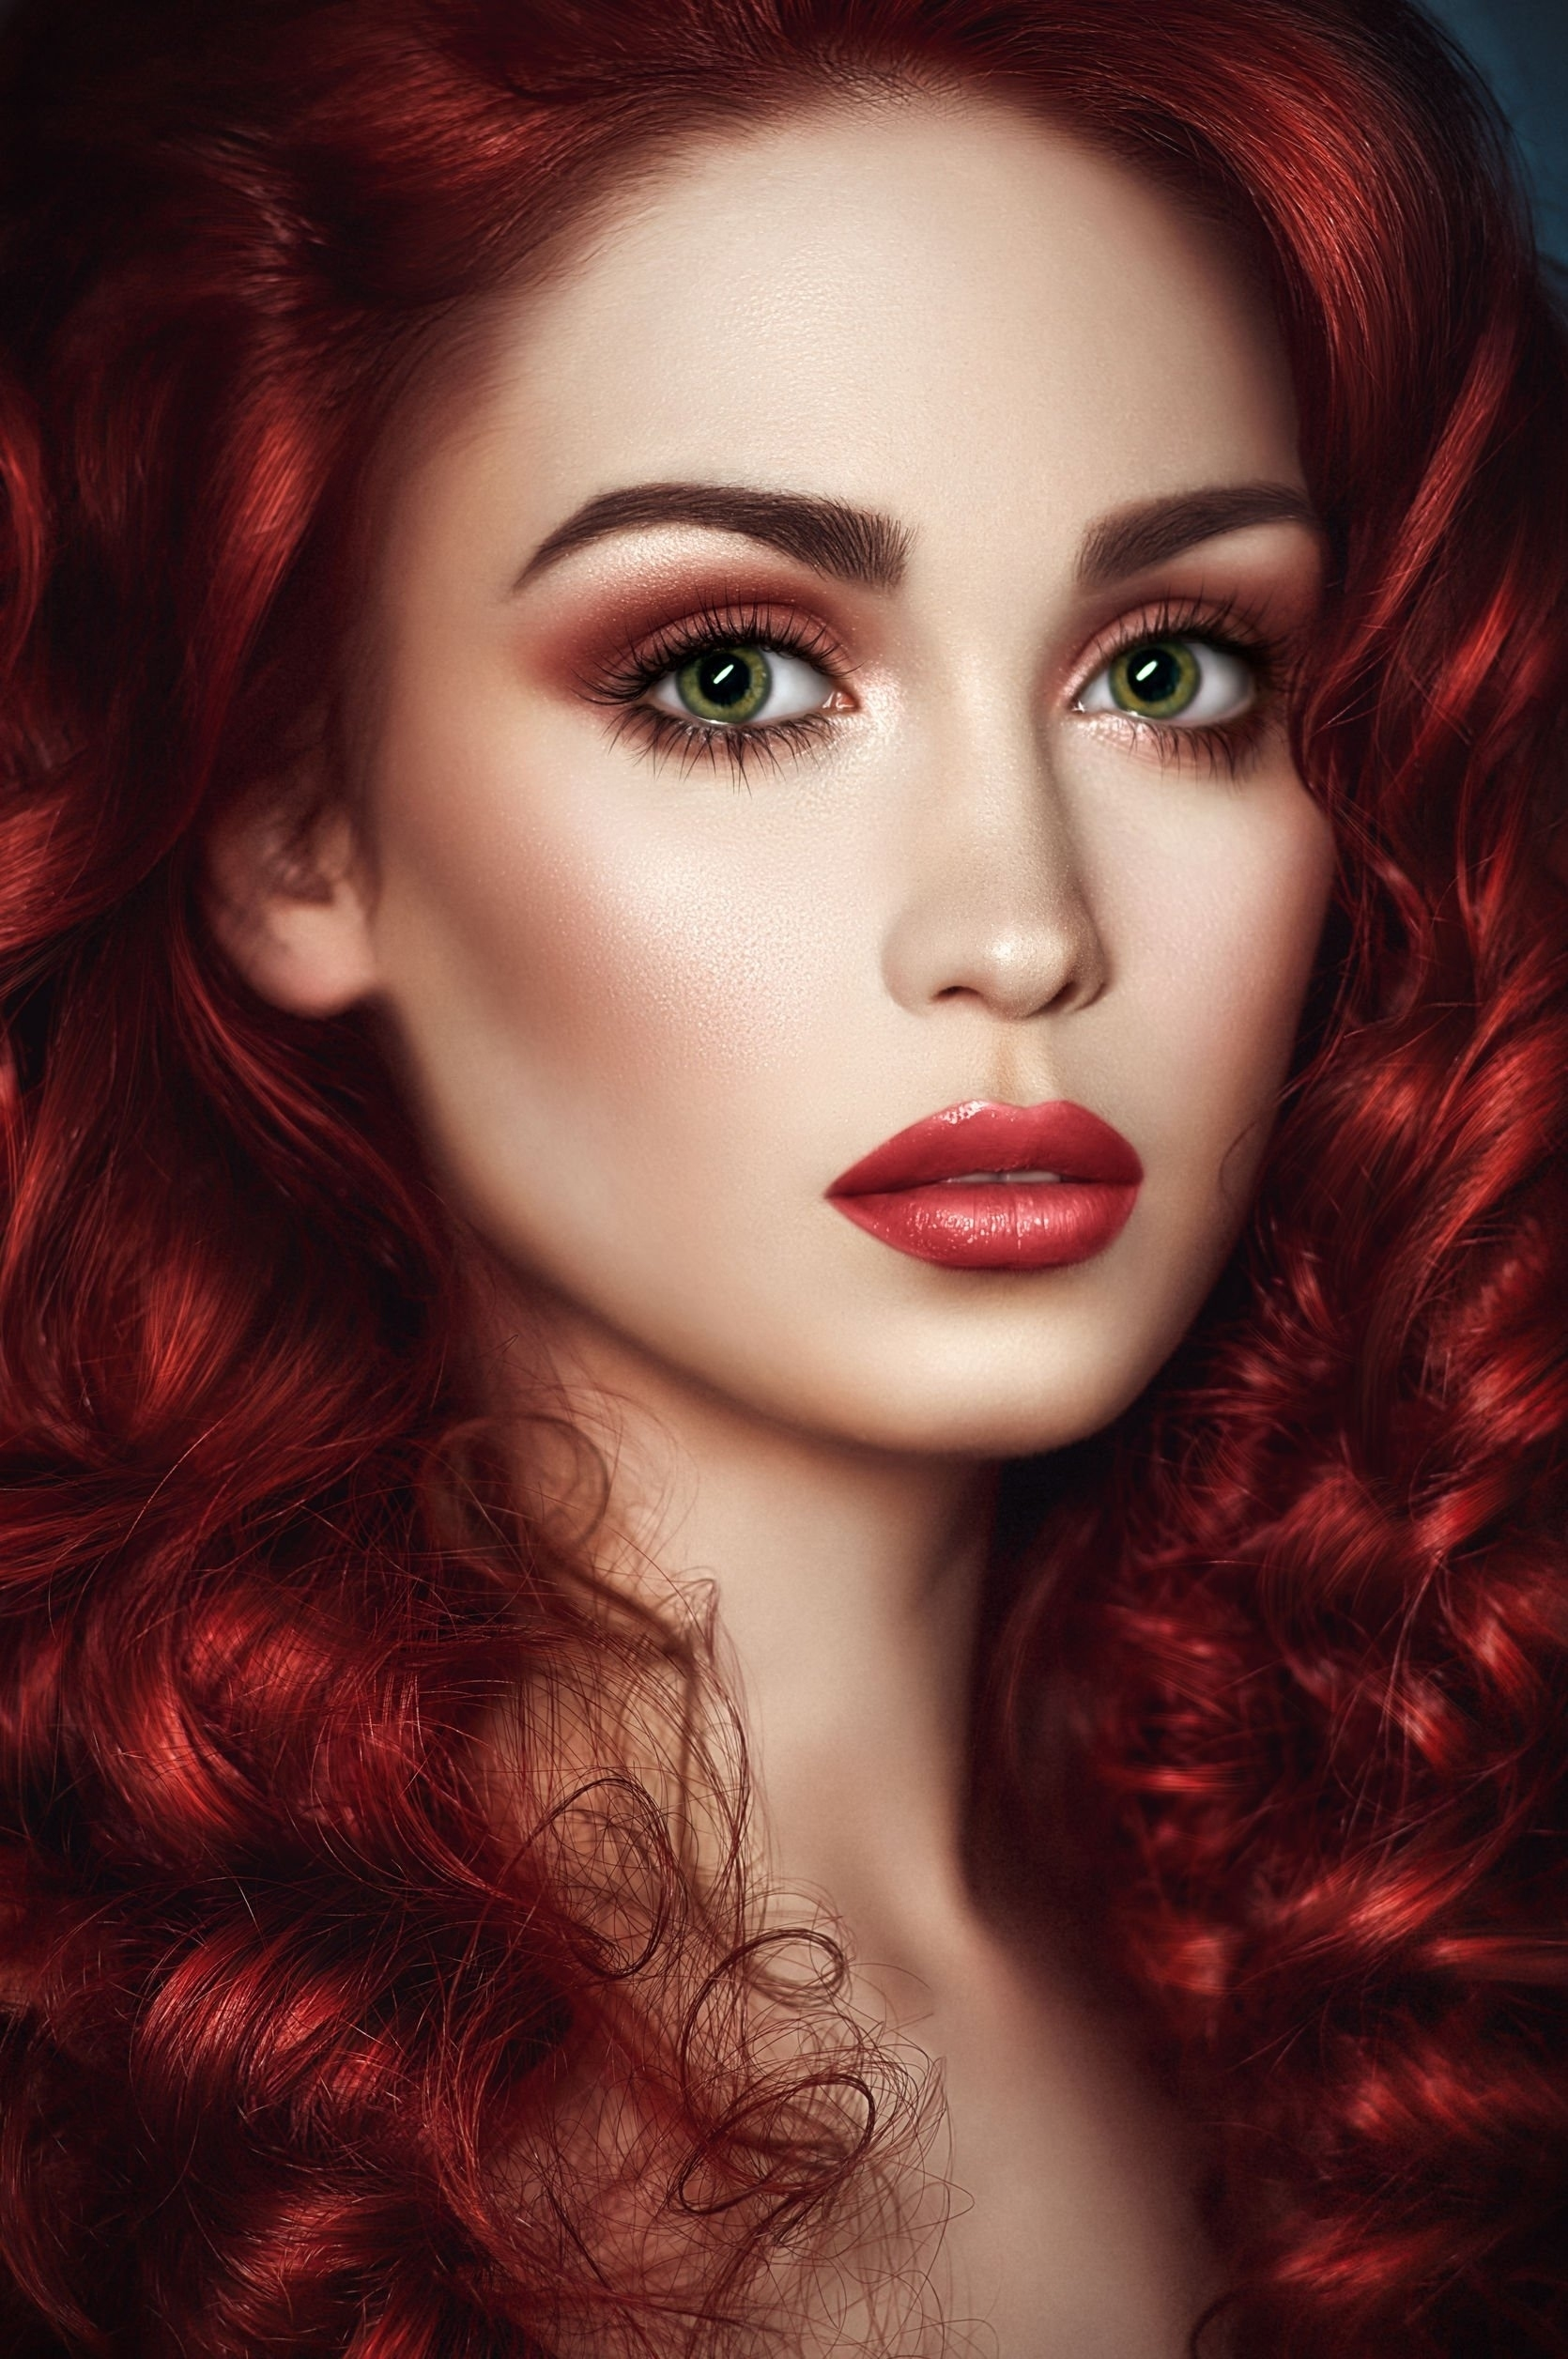 Dark Red Hair Green Eyes Makeup   Saubhaya Makeup in Makeup For Green Eyes And Dark Red Hair